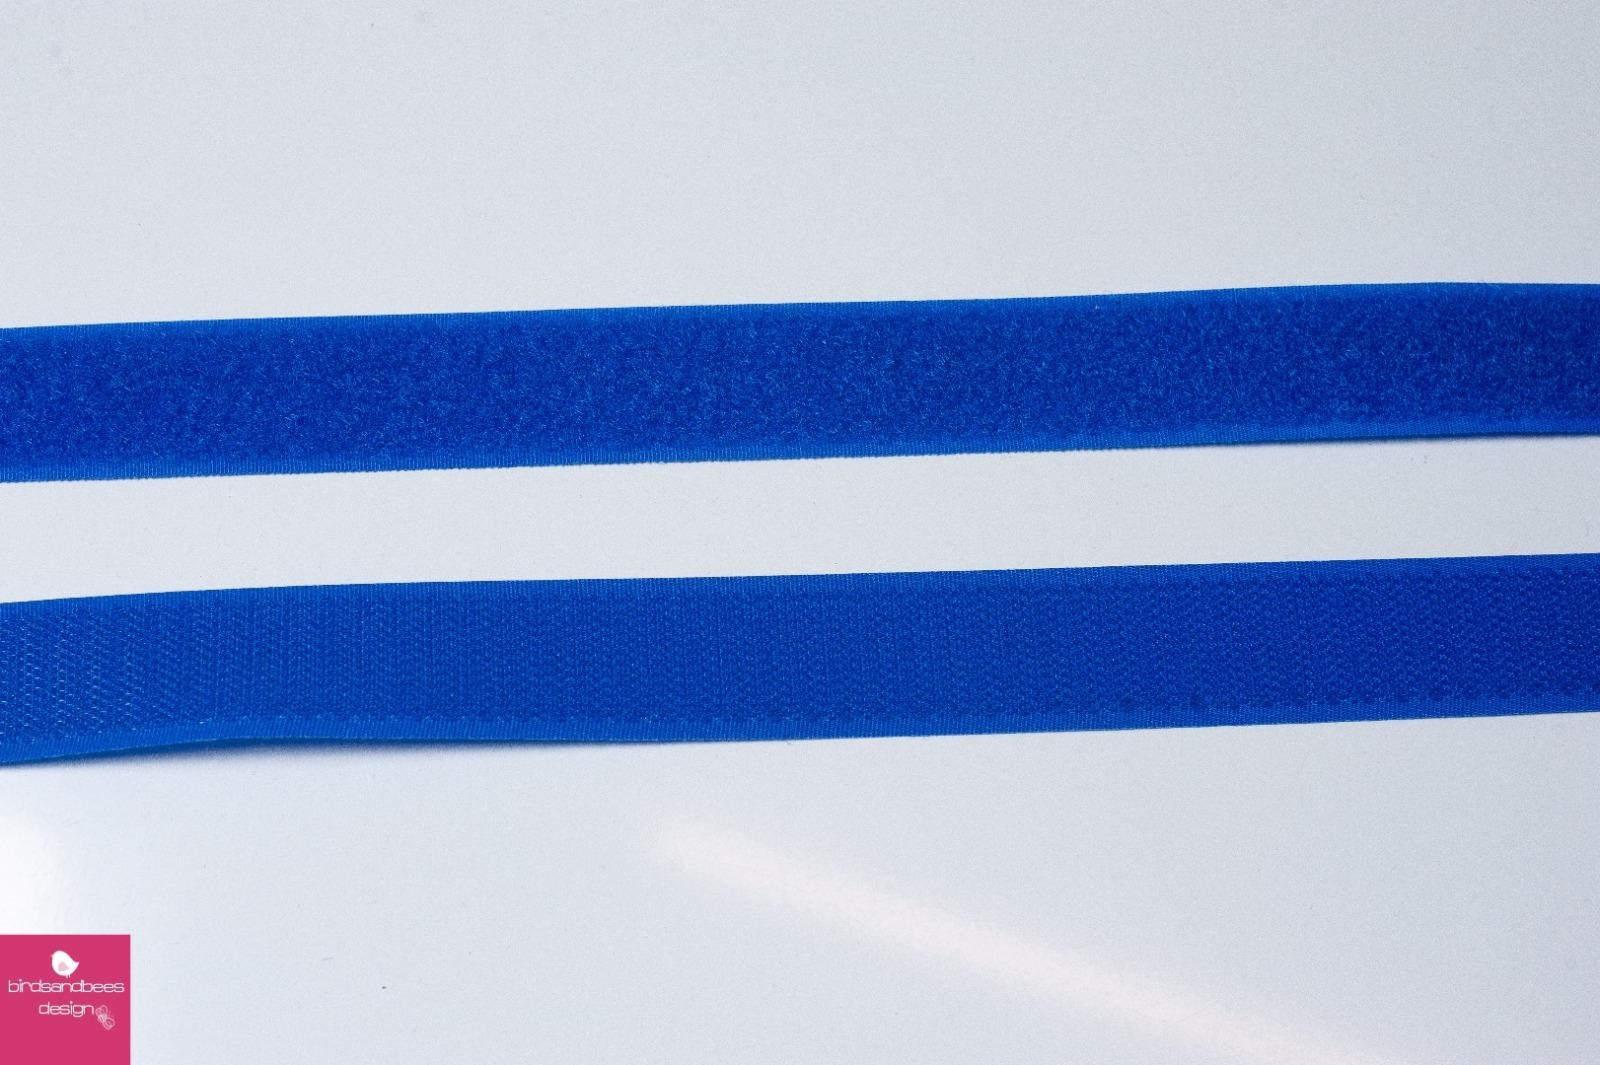 Klettband 1m 25mm - Blau